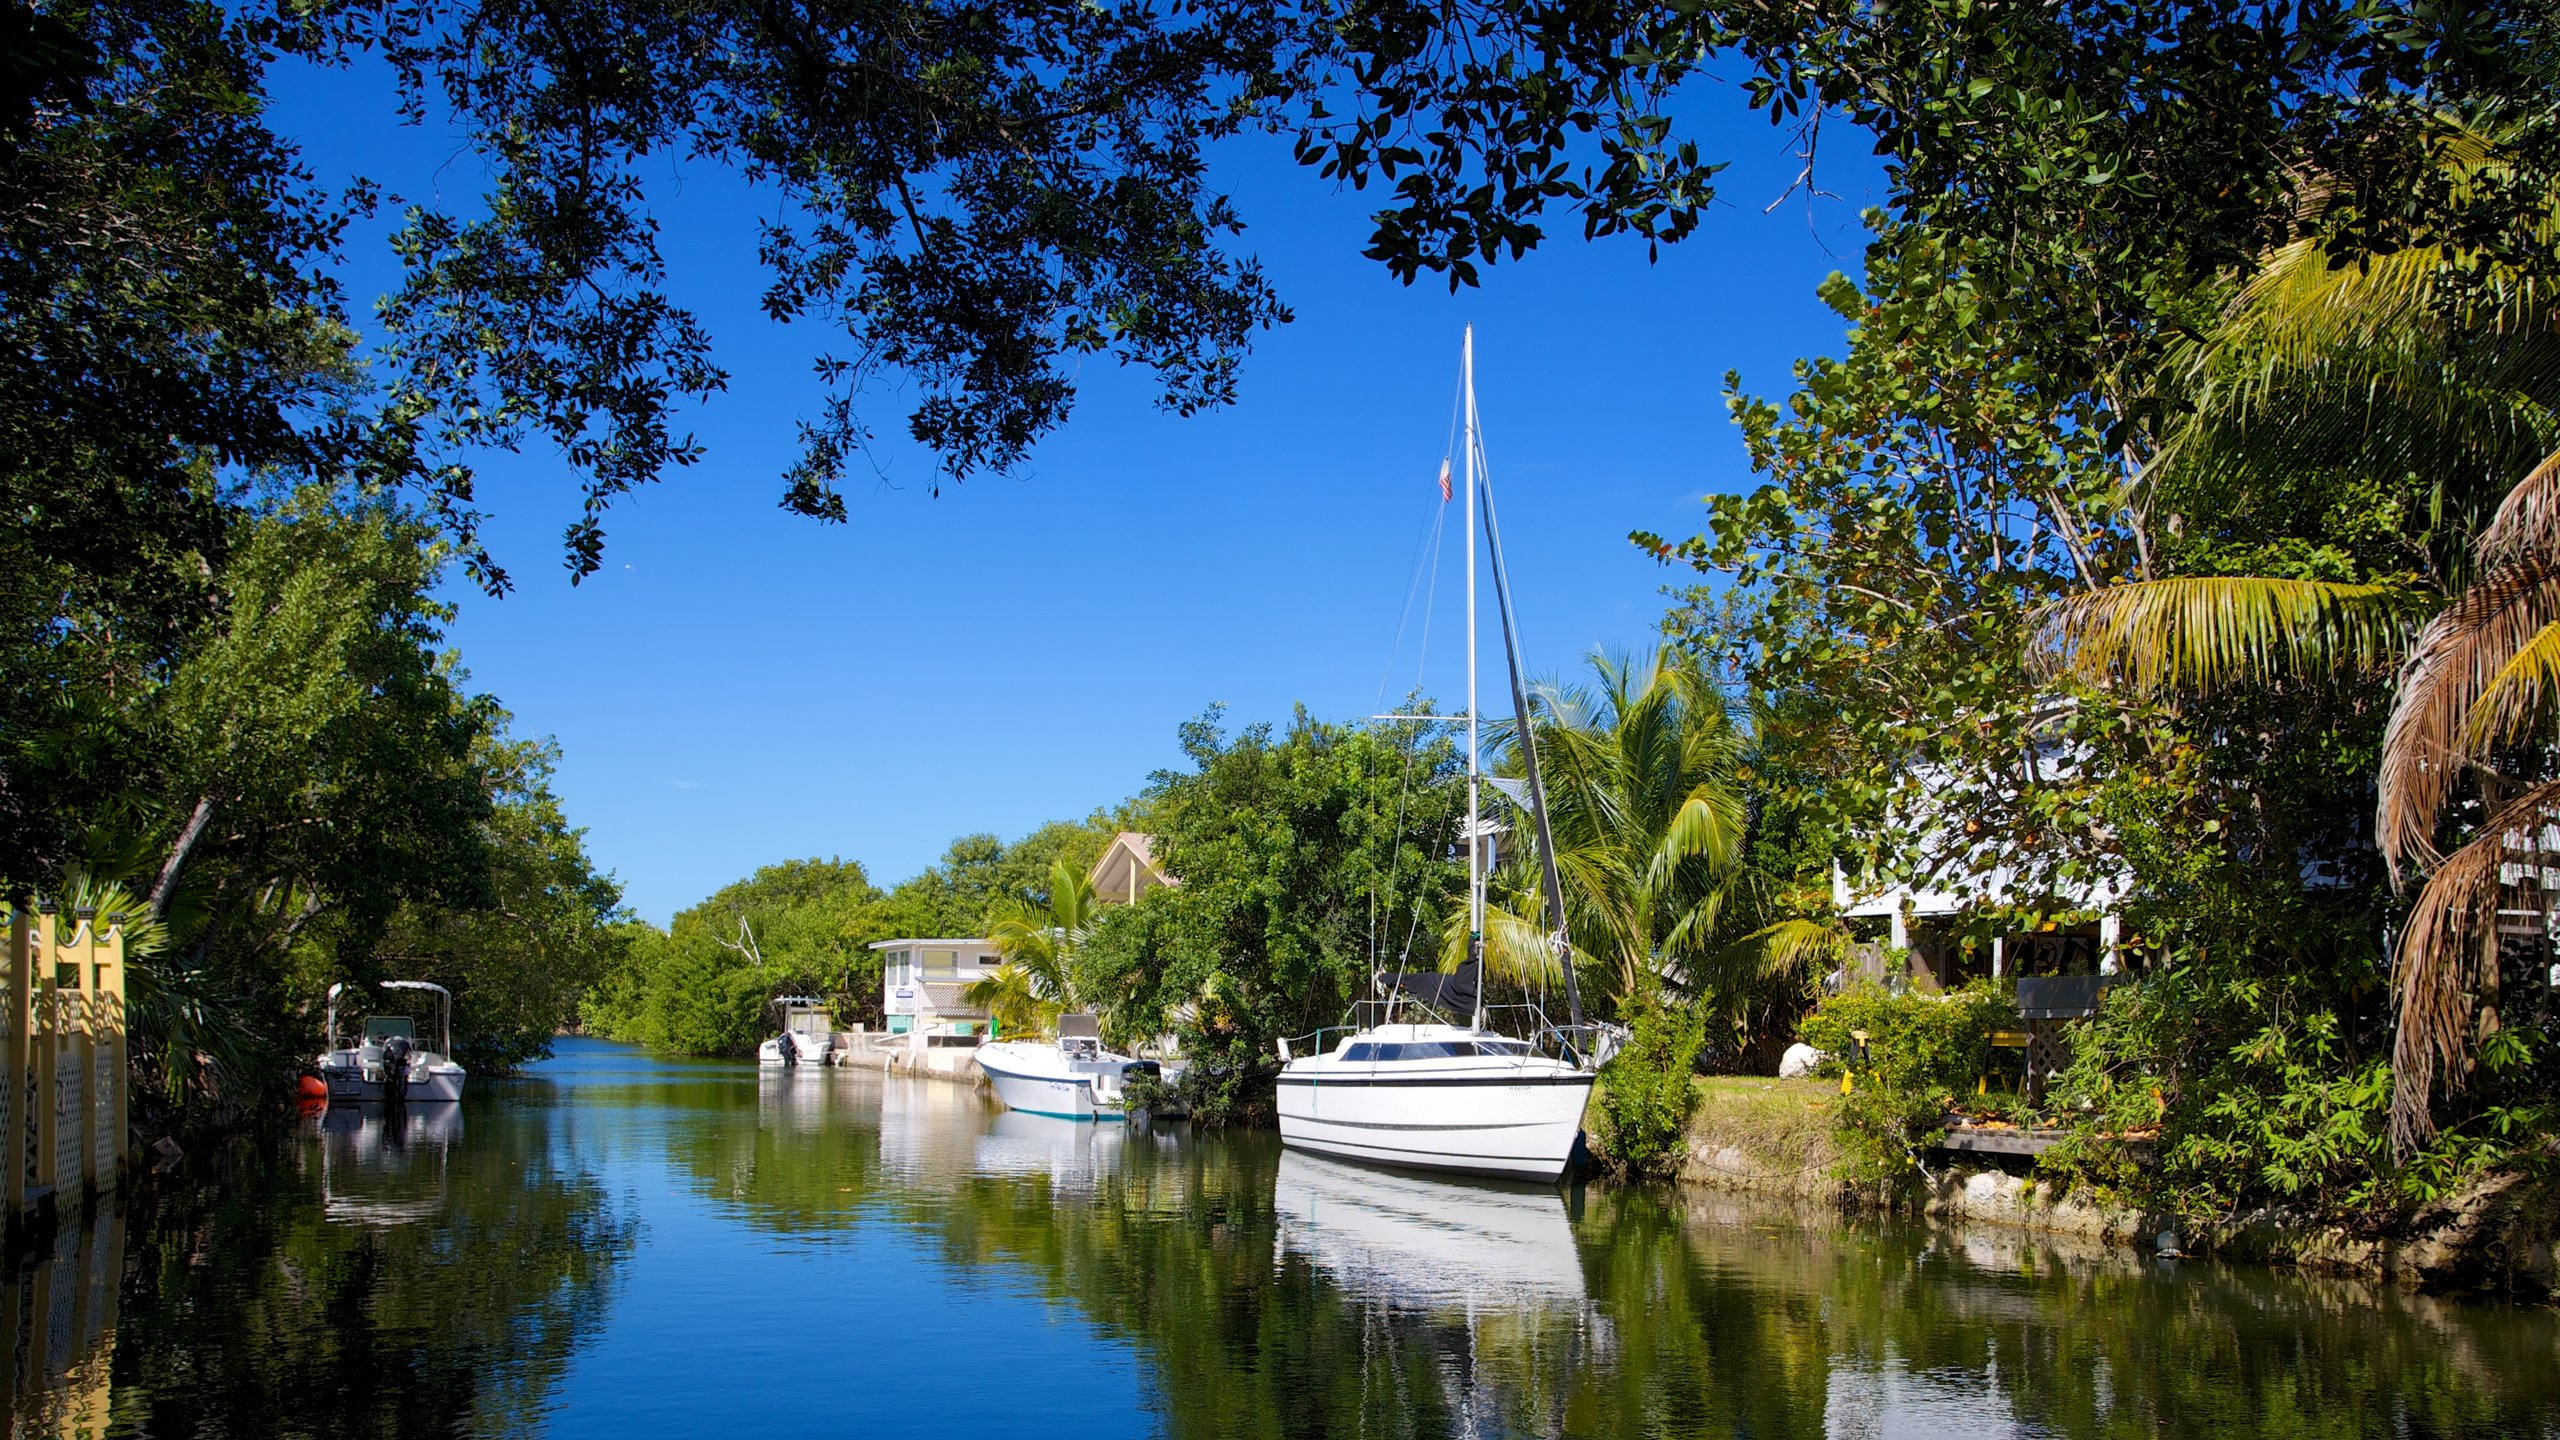 Big Pine Key, Florida, United States of America